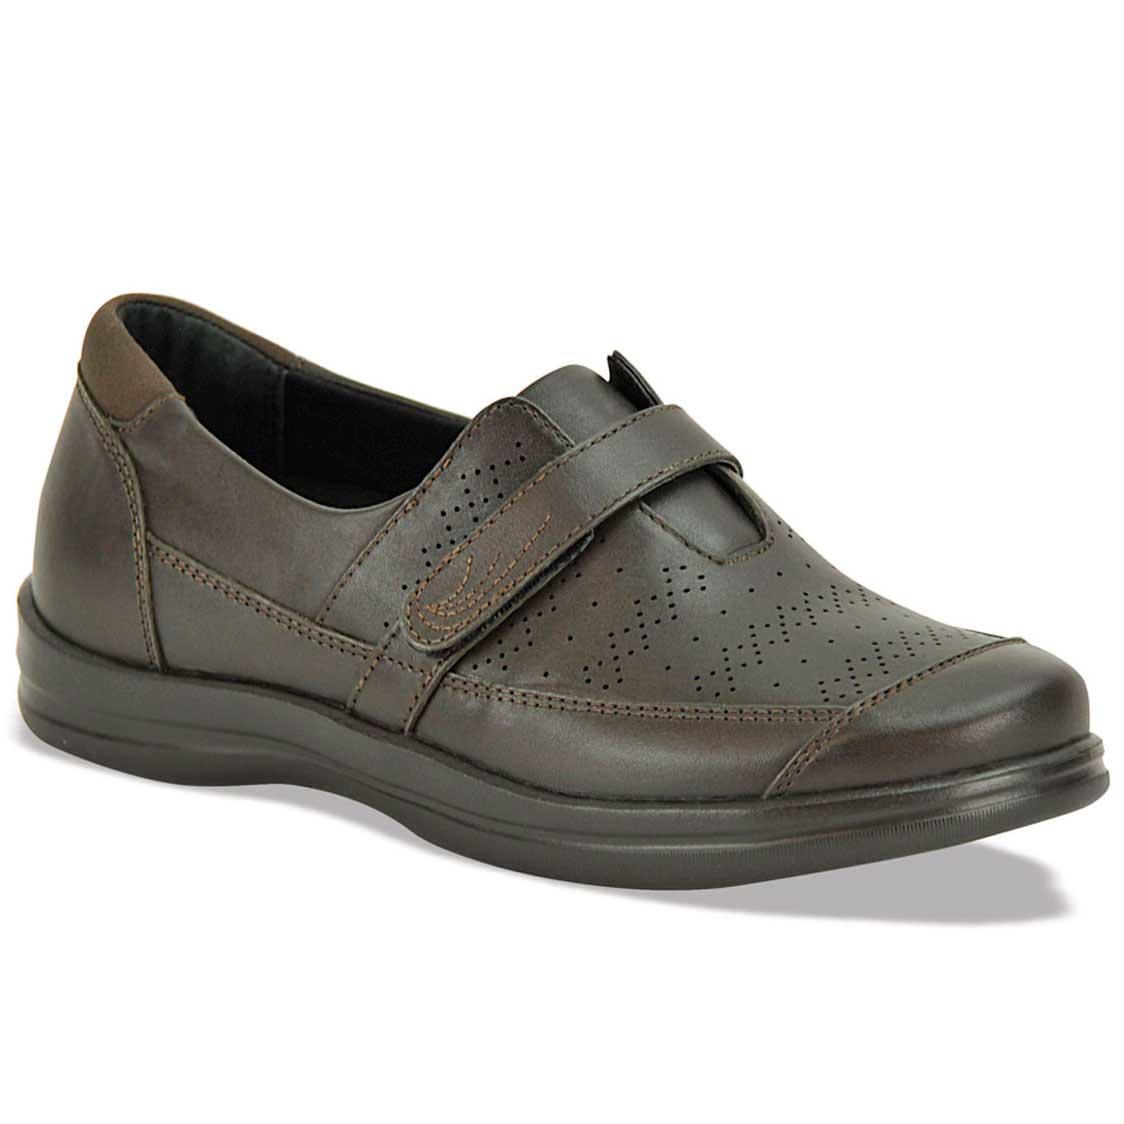 Apex Womens Diabetic Shoes